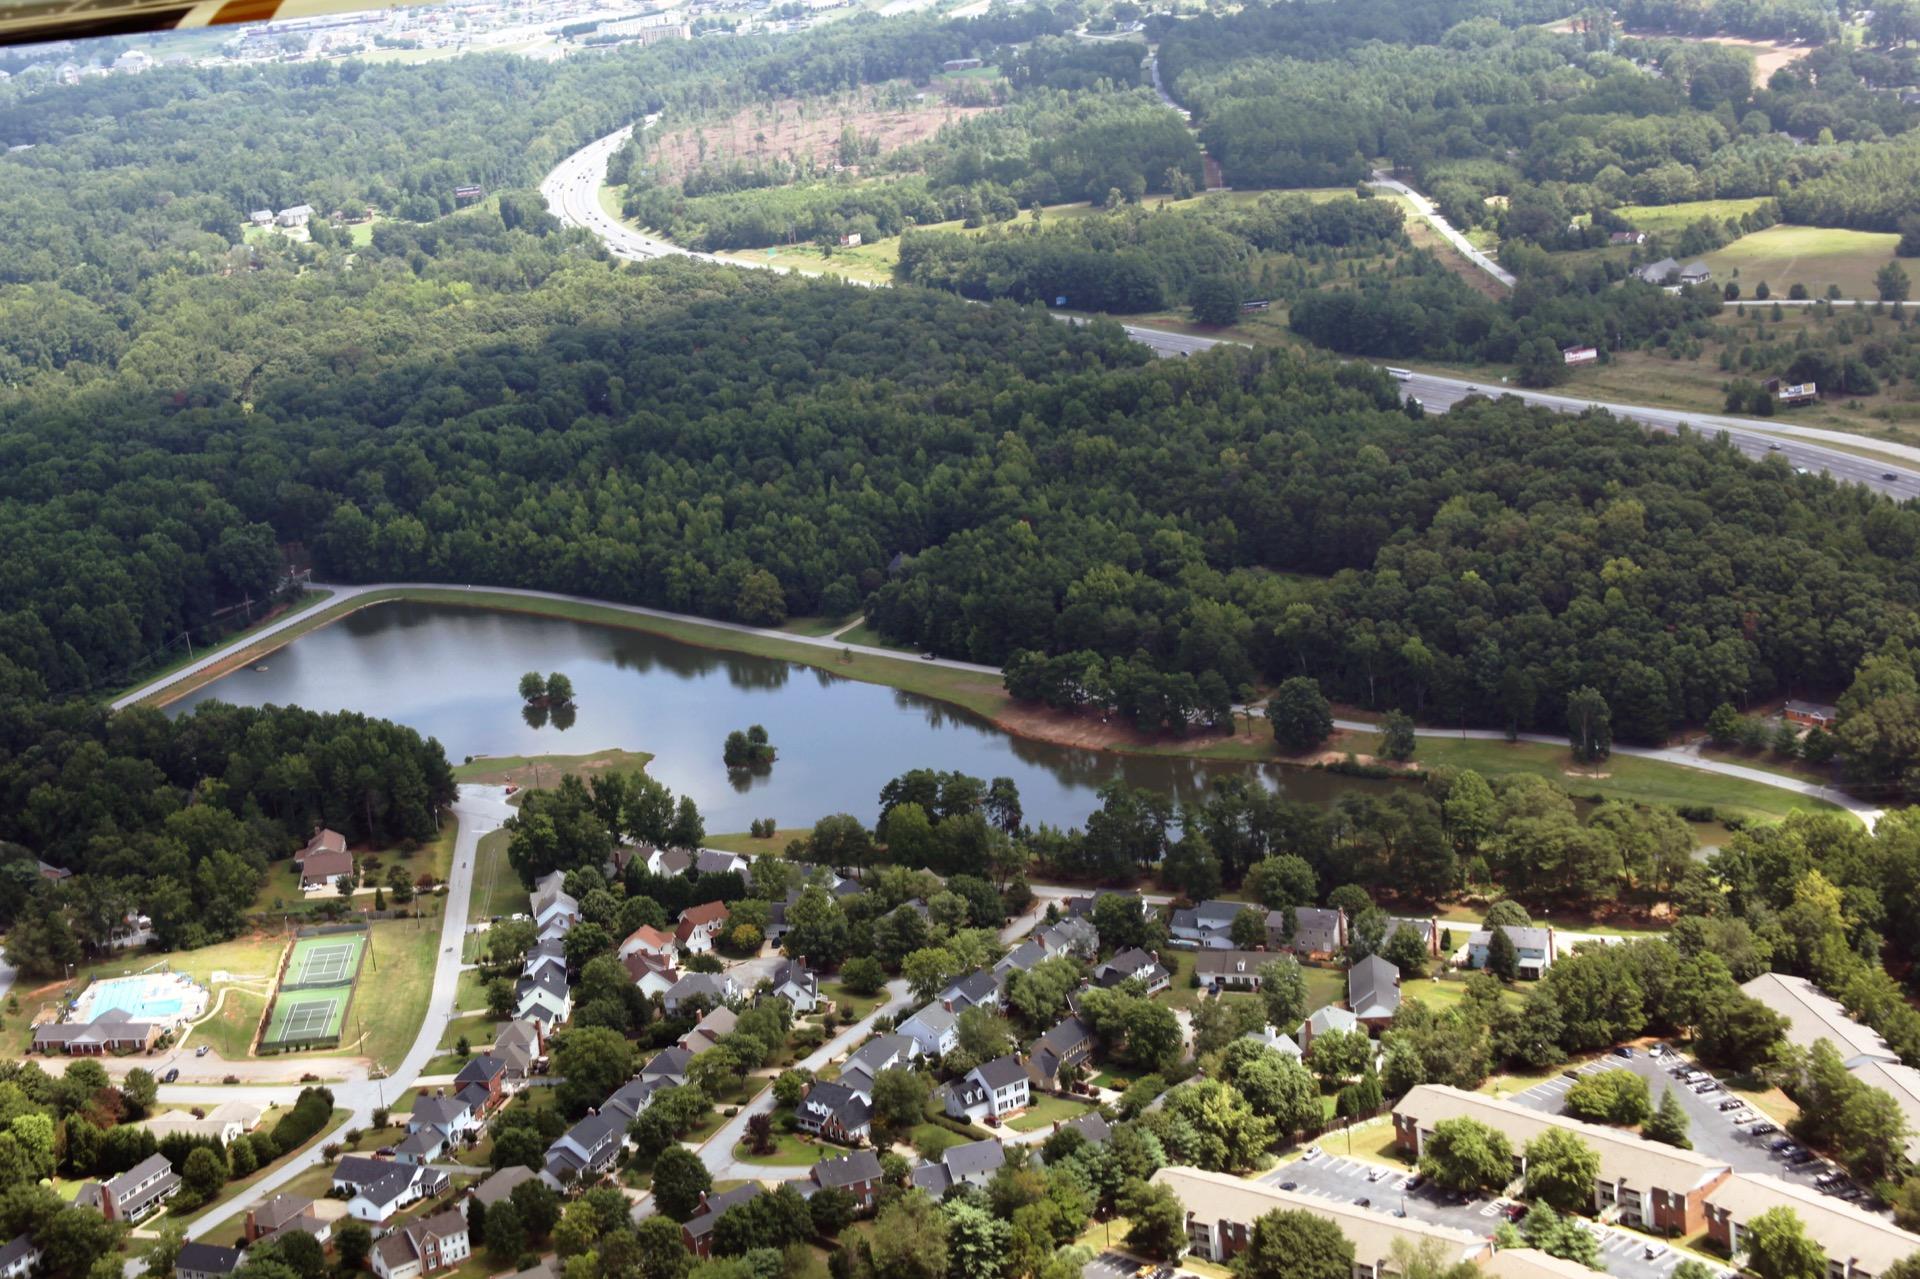 oak grove park aerial view